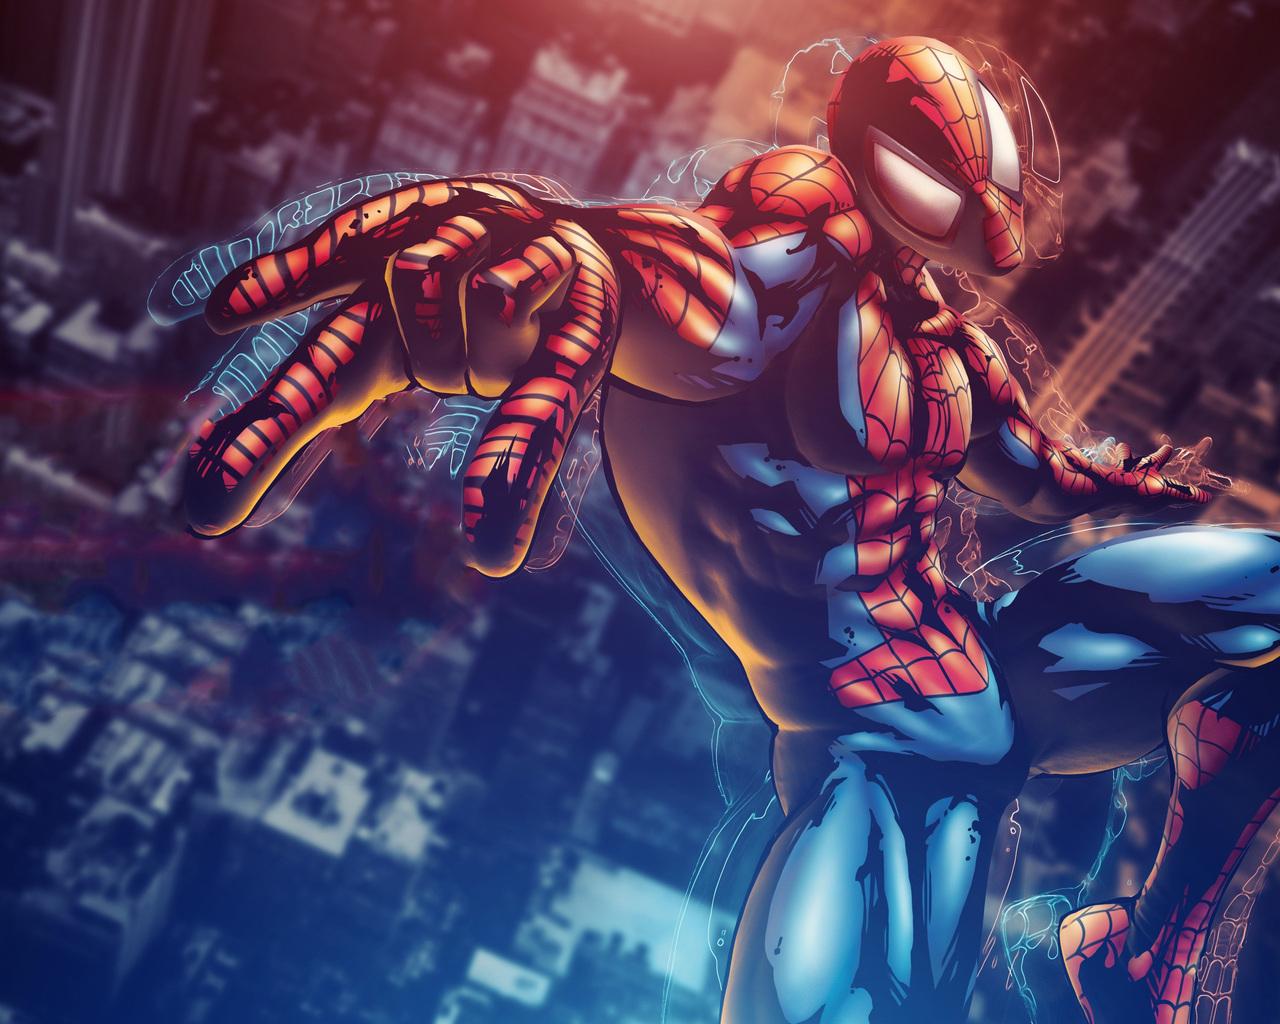 1280x1024 Marvel Vs Capcom 3 Spiderman 4k 1280x1024 Resolution Hd